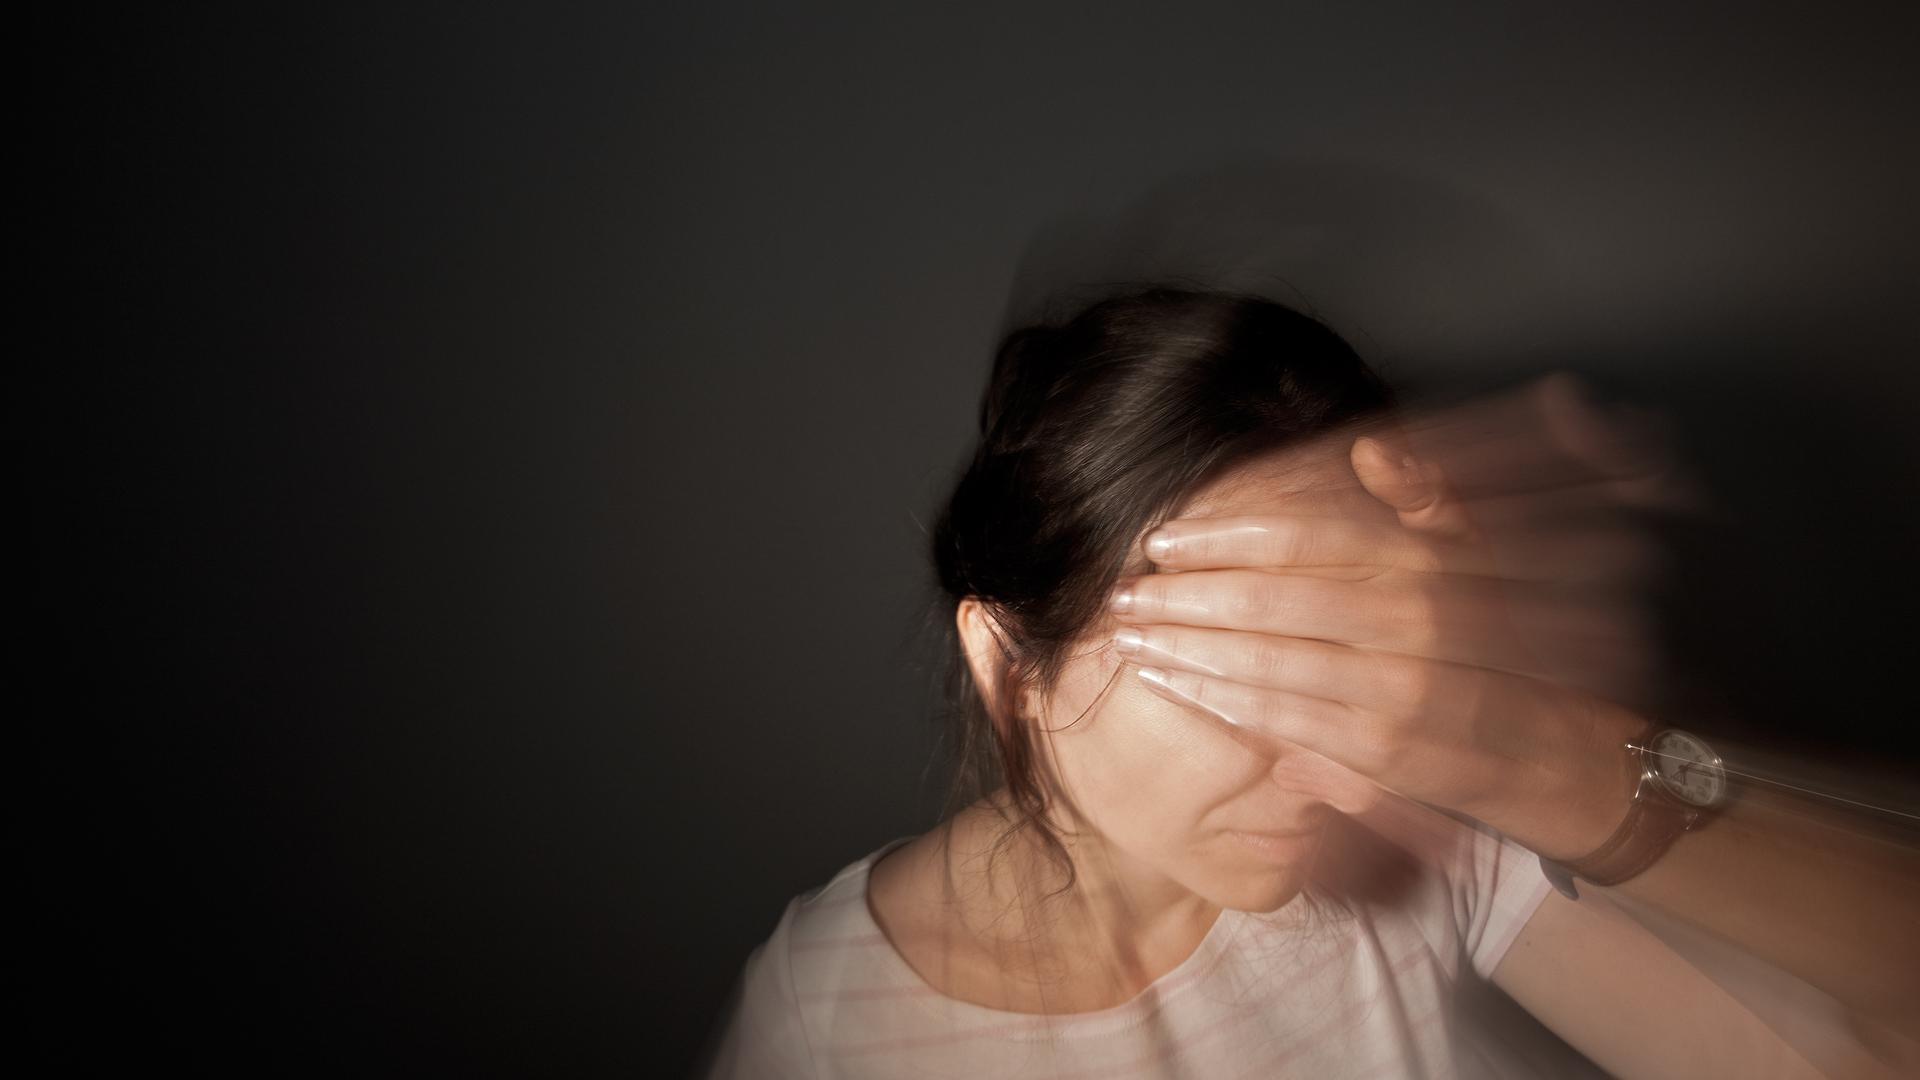 Eine Frau fasst sich an den Kopf.